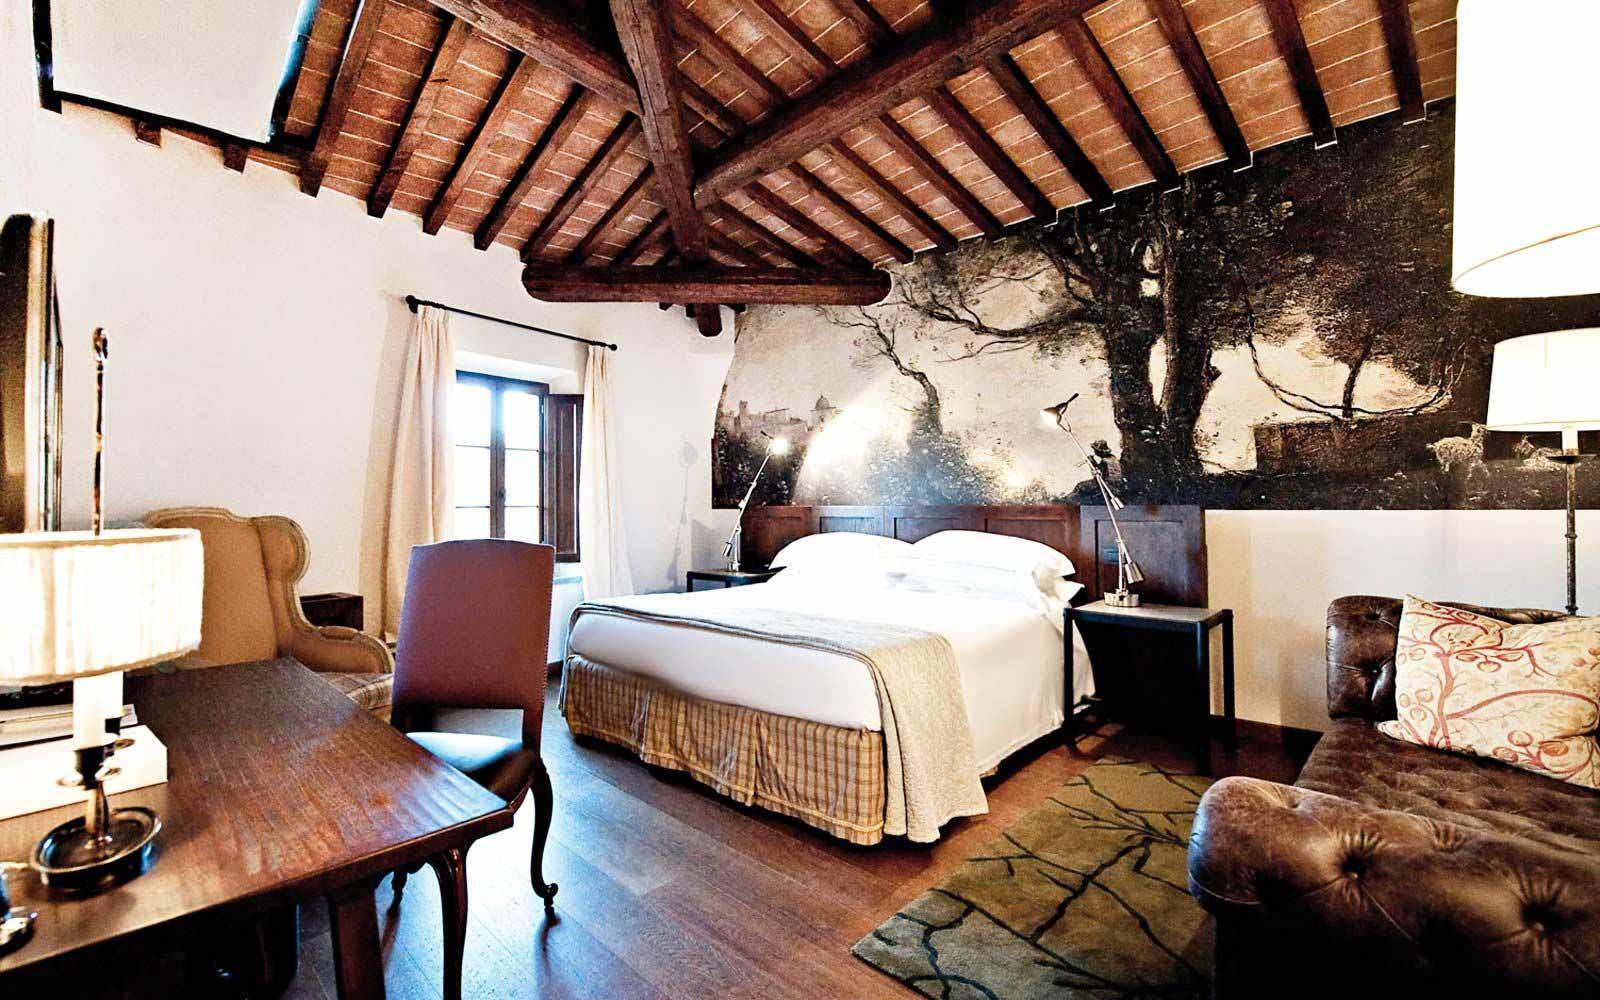 Deluxe room at Castel Monastero Tuscan Resort & Spa